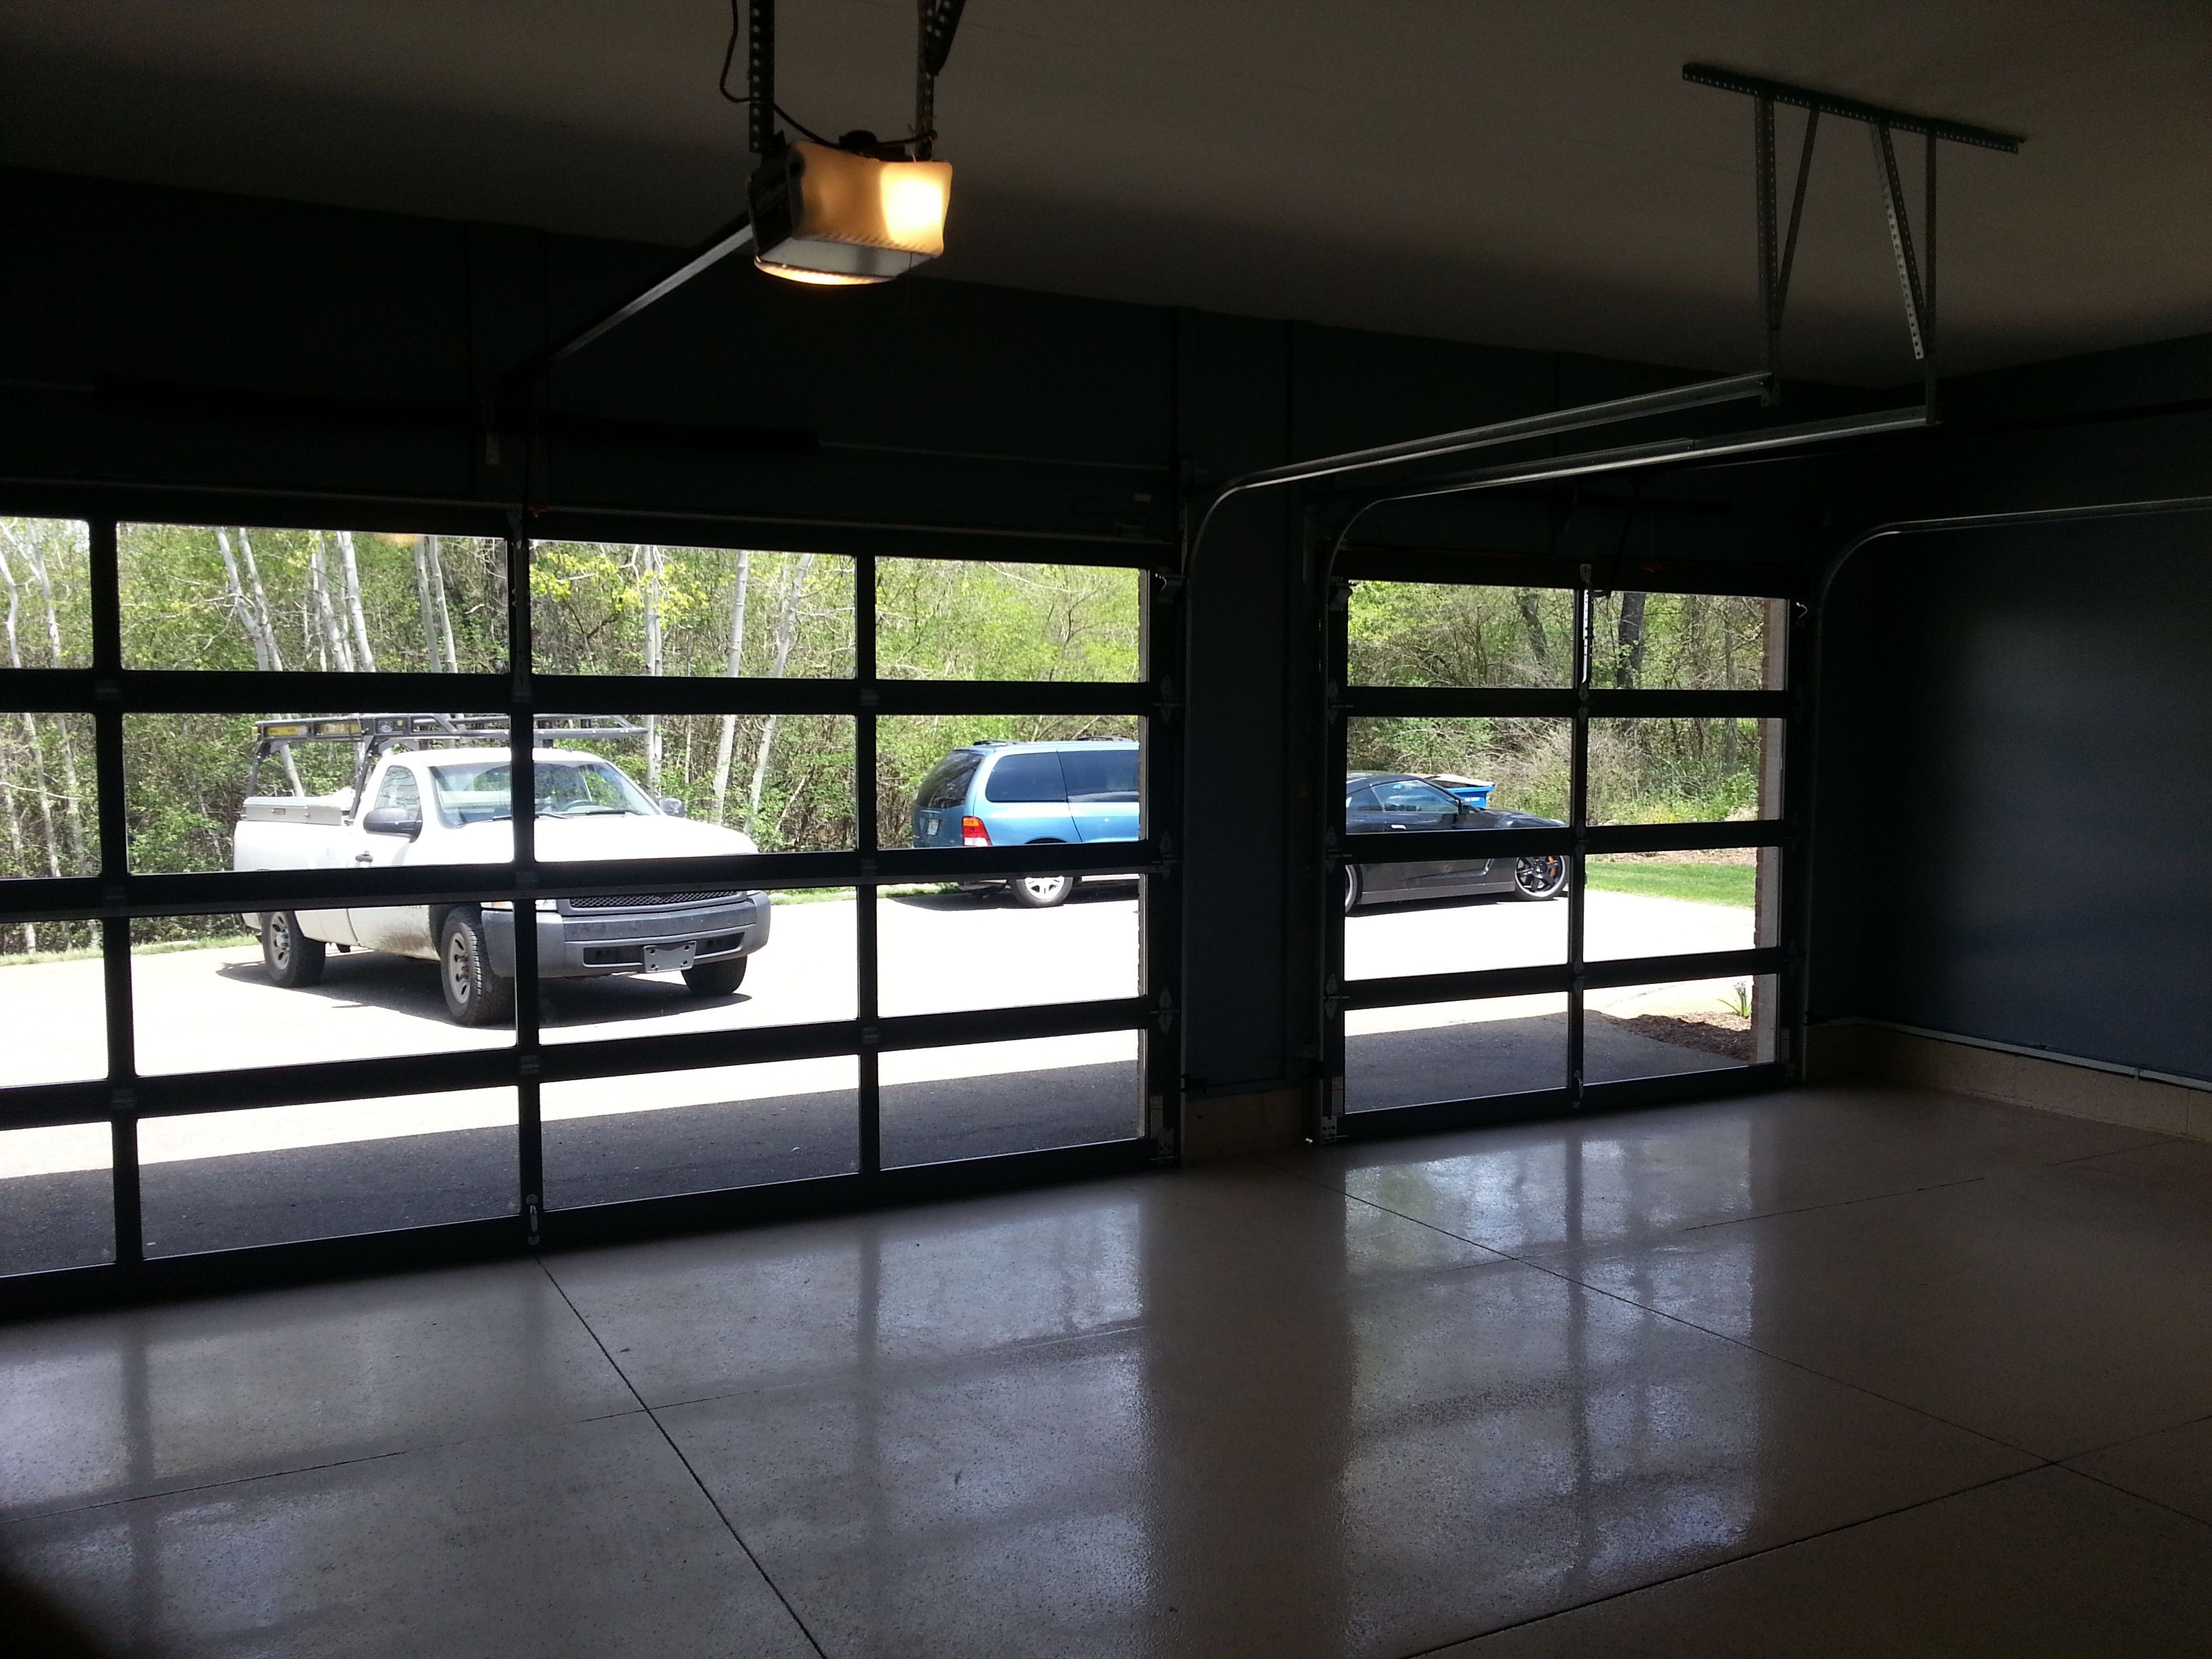 dallas keypad garage ga residential of size electric overhead full best cost doors opener repair precision door maintenance